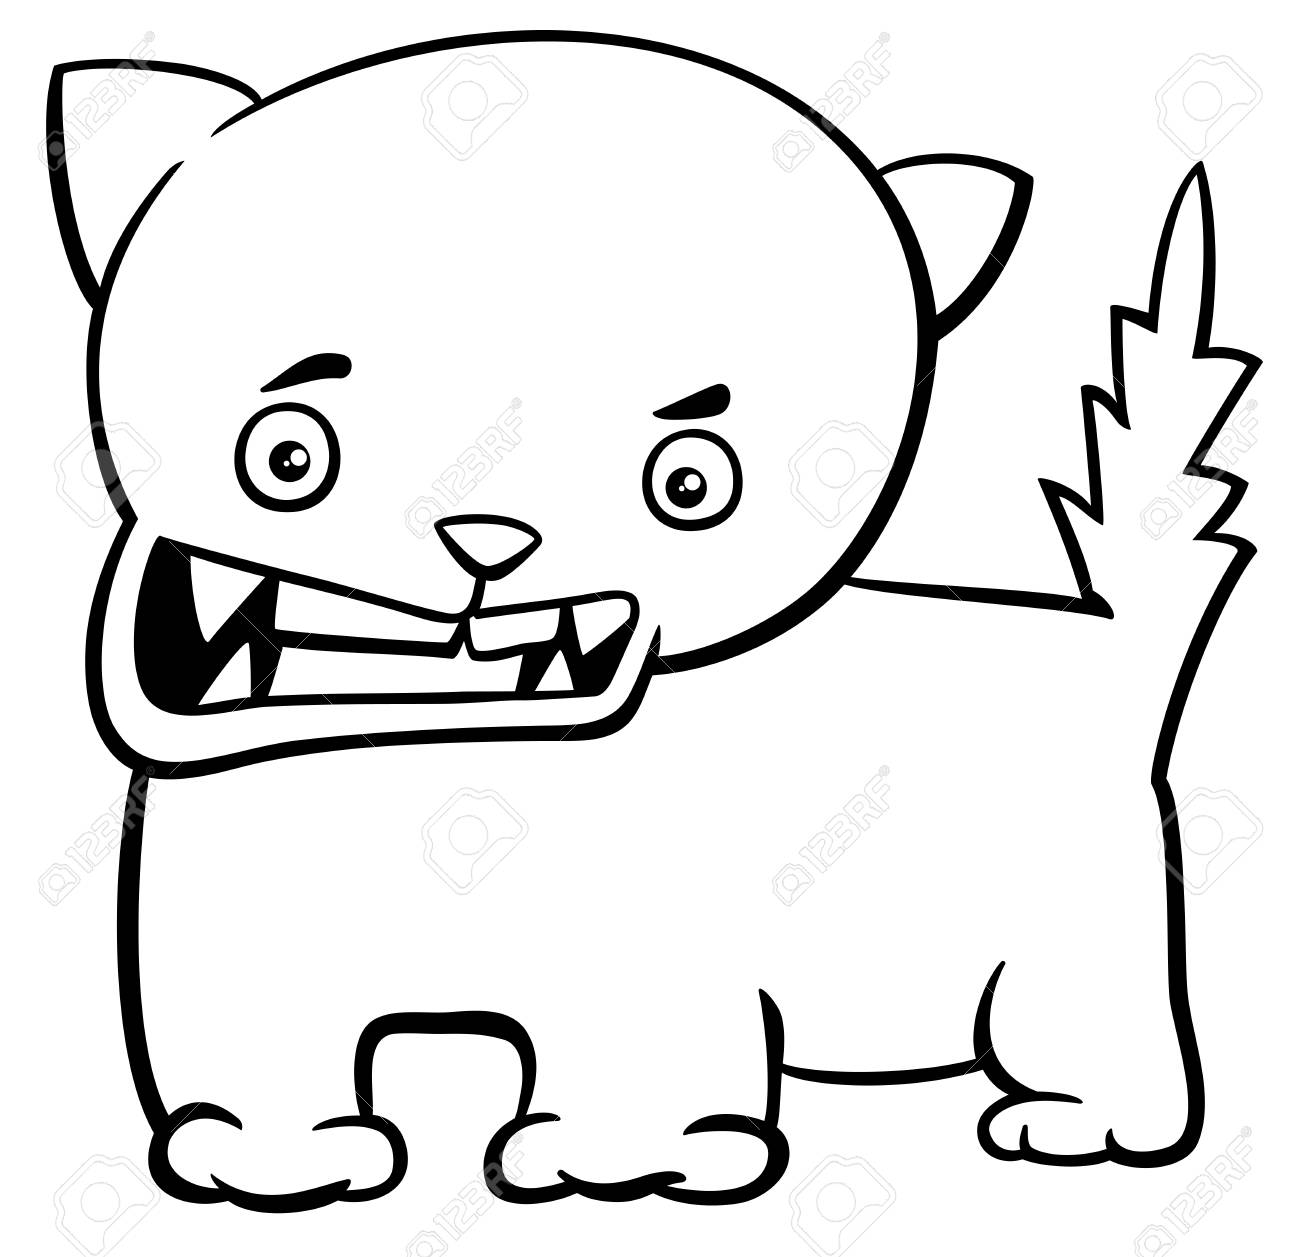 Dibujos Animados De Blanco Y Negro Ilustracion De Gato O Gatito